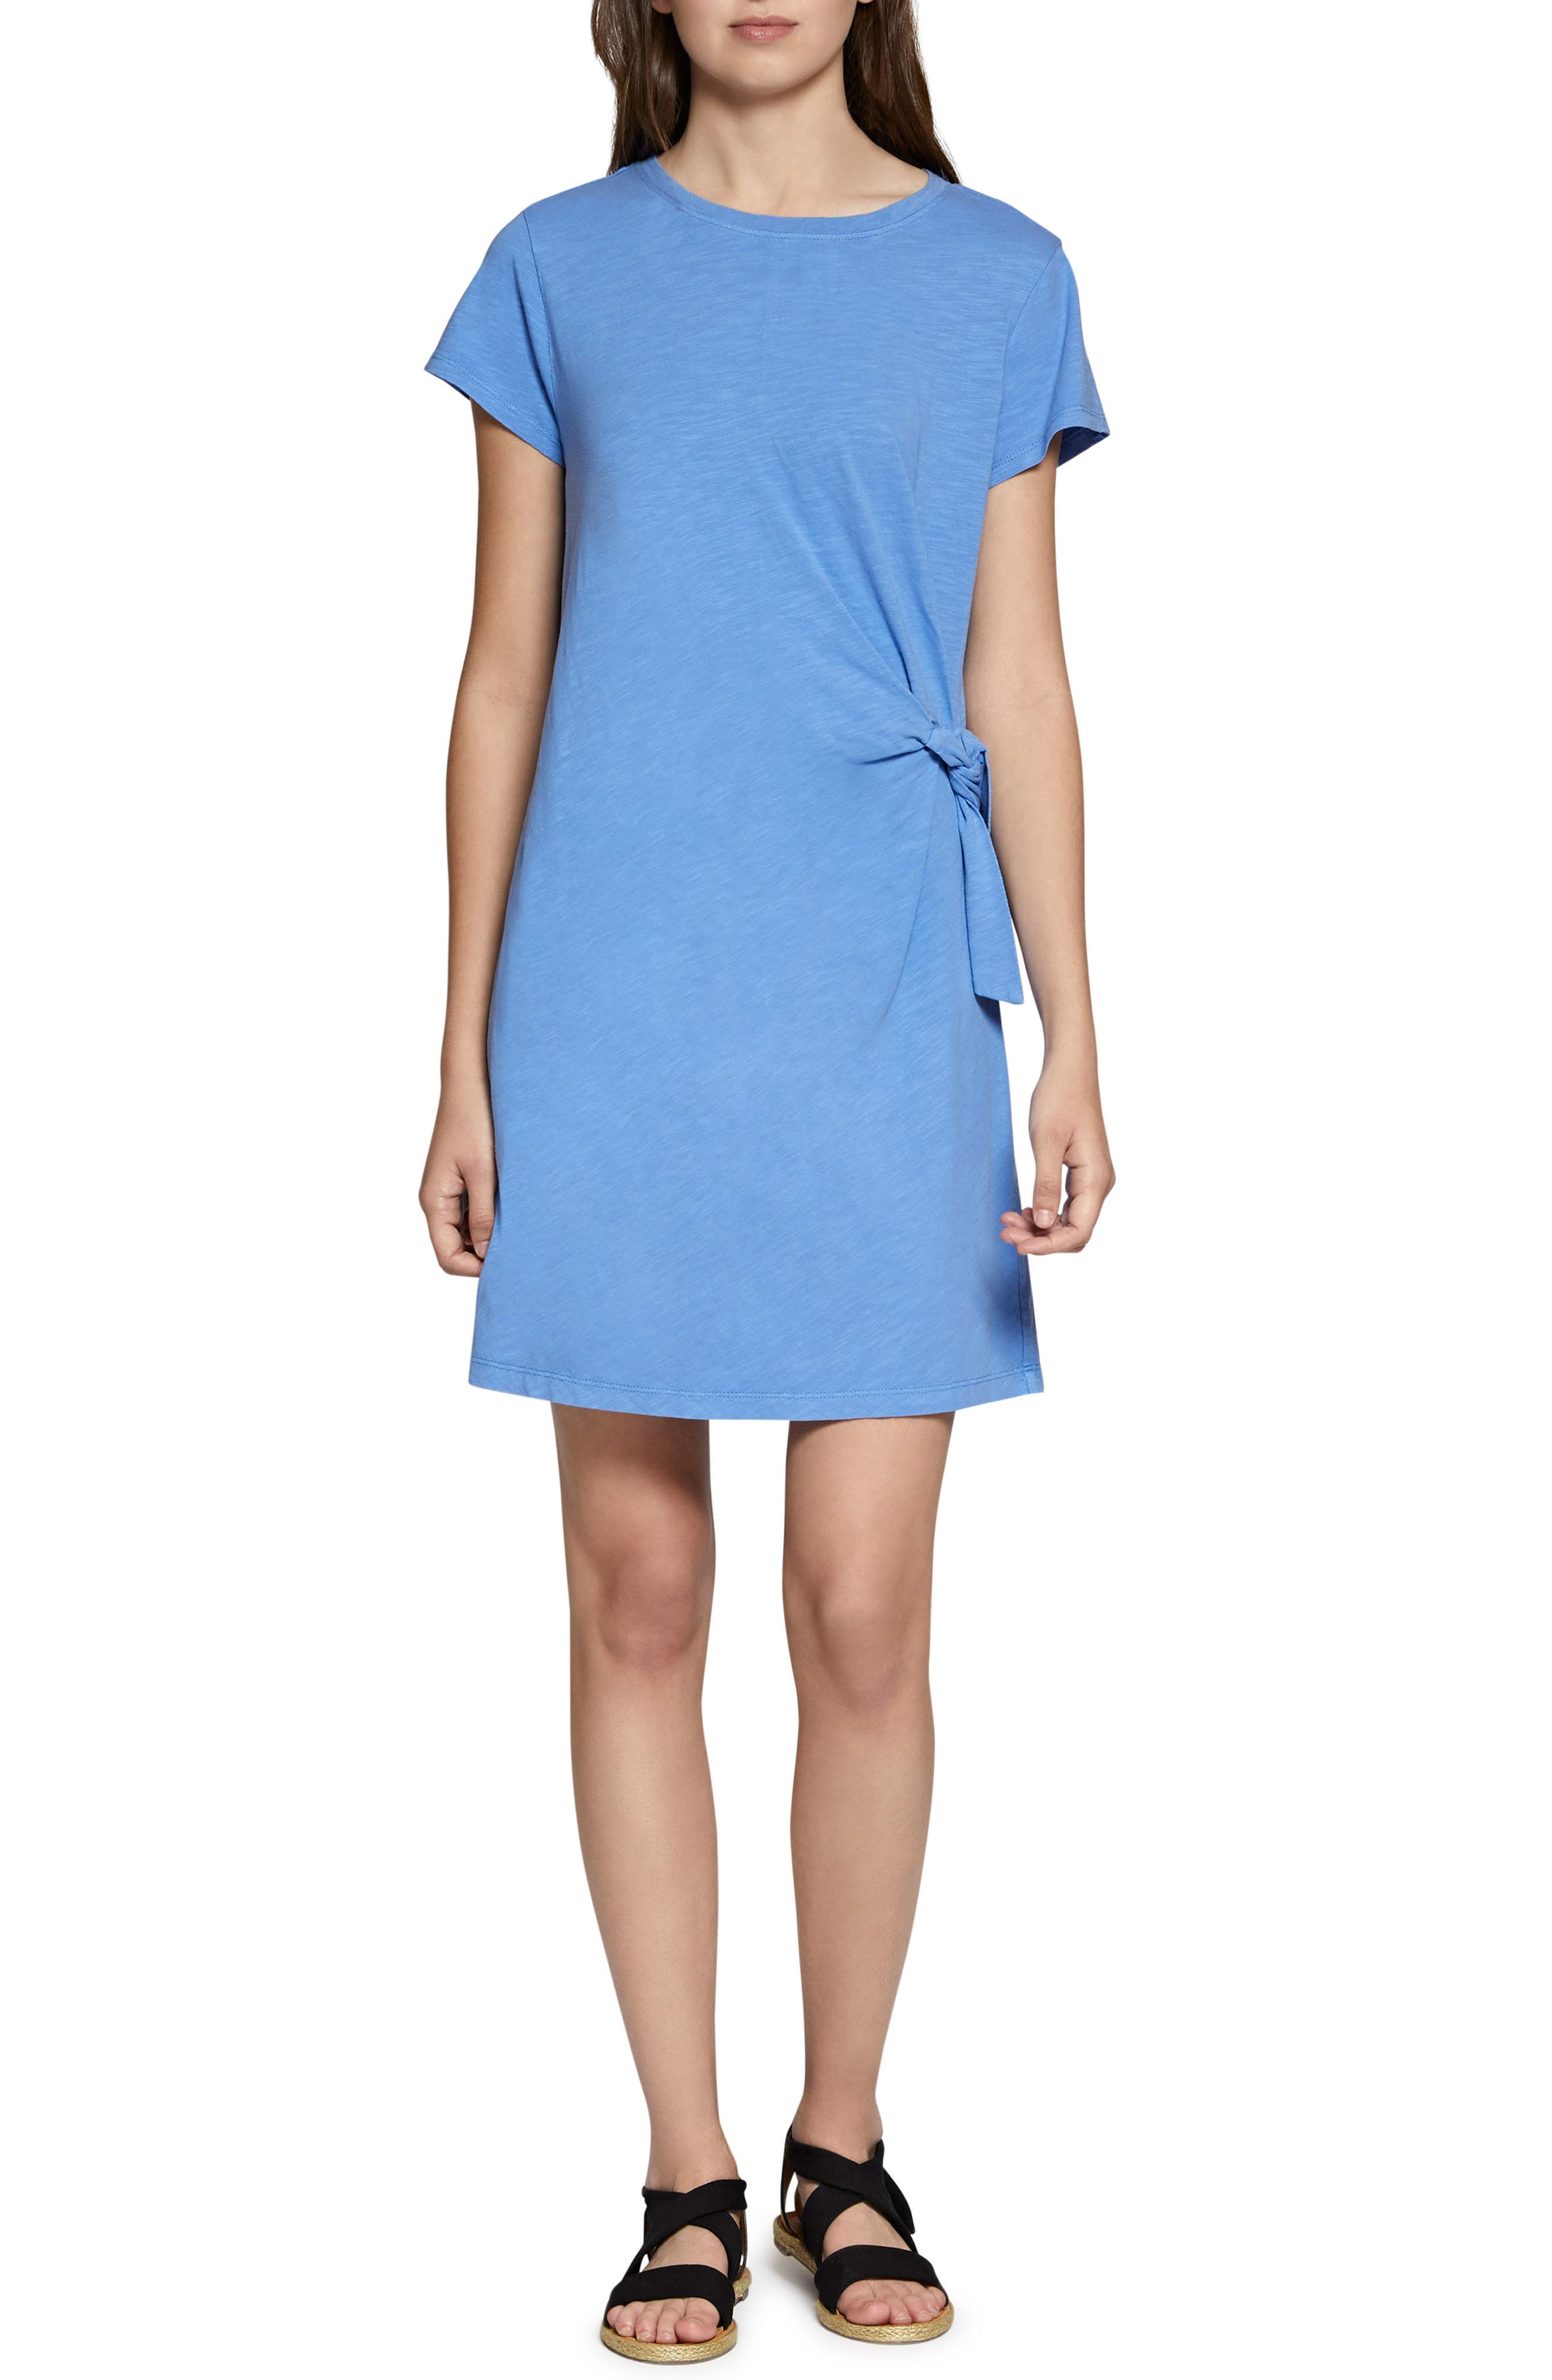 Wrapsody Dress,                         Main,                         color, Iris